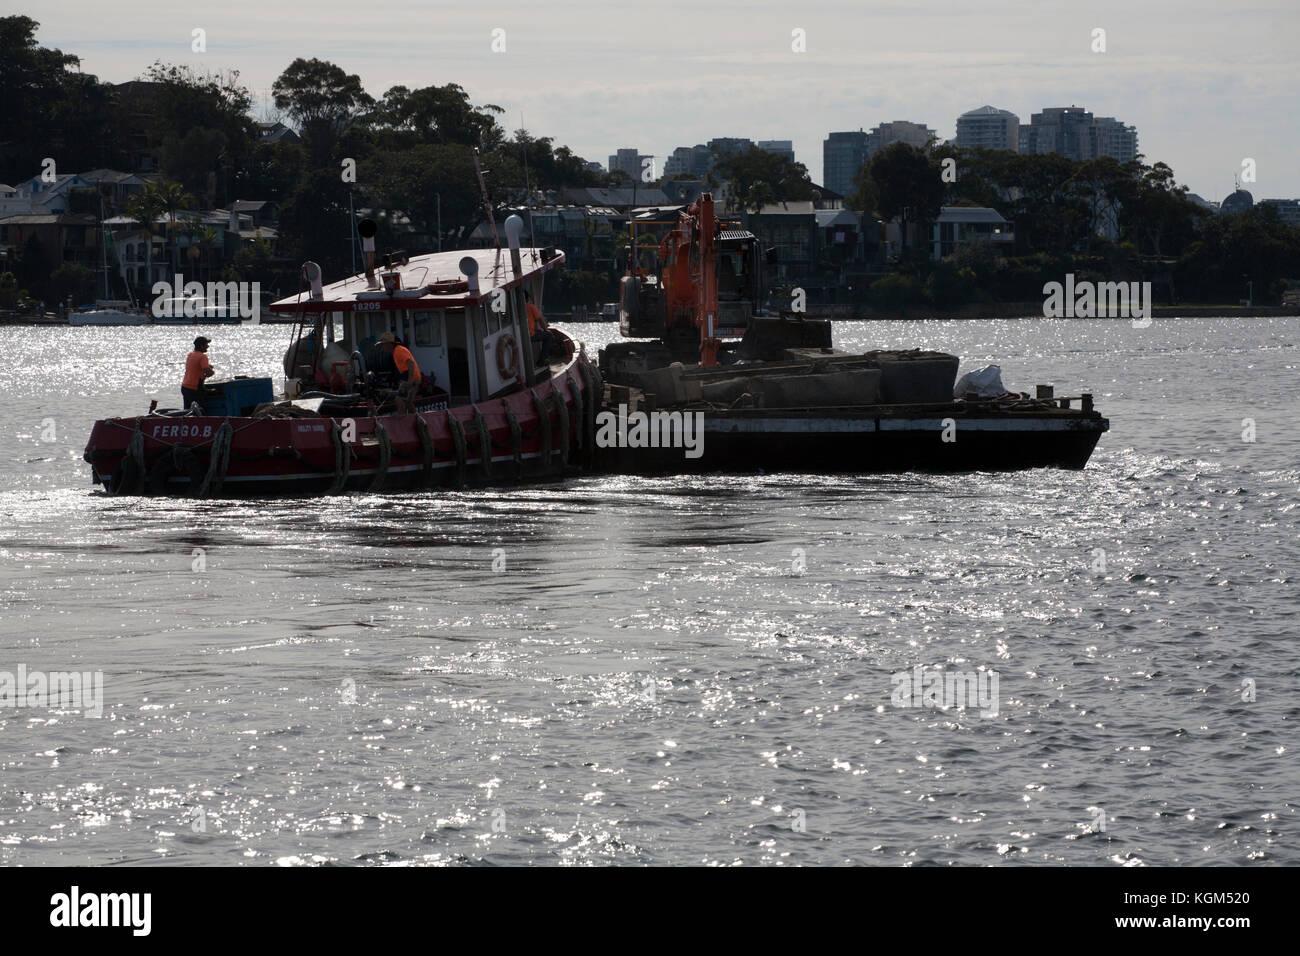 ability barge jones bay pyrmont sydney new south wales australia - Stock Image